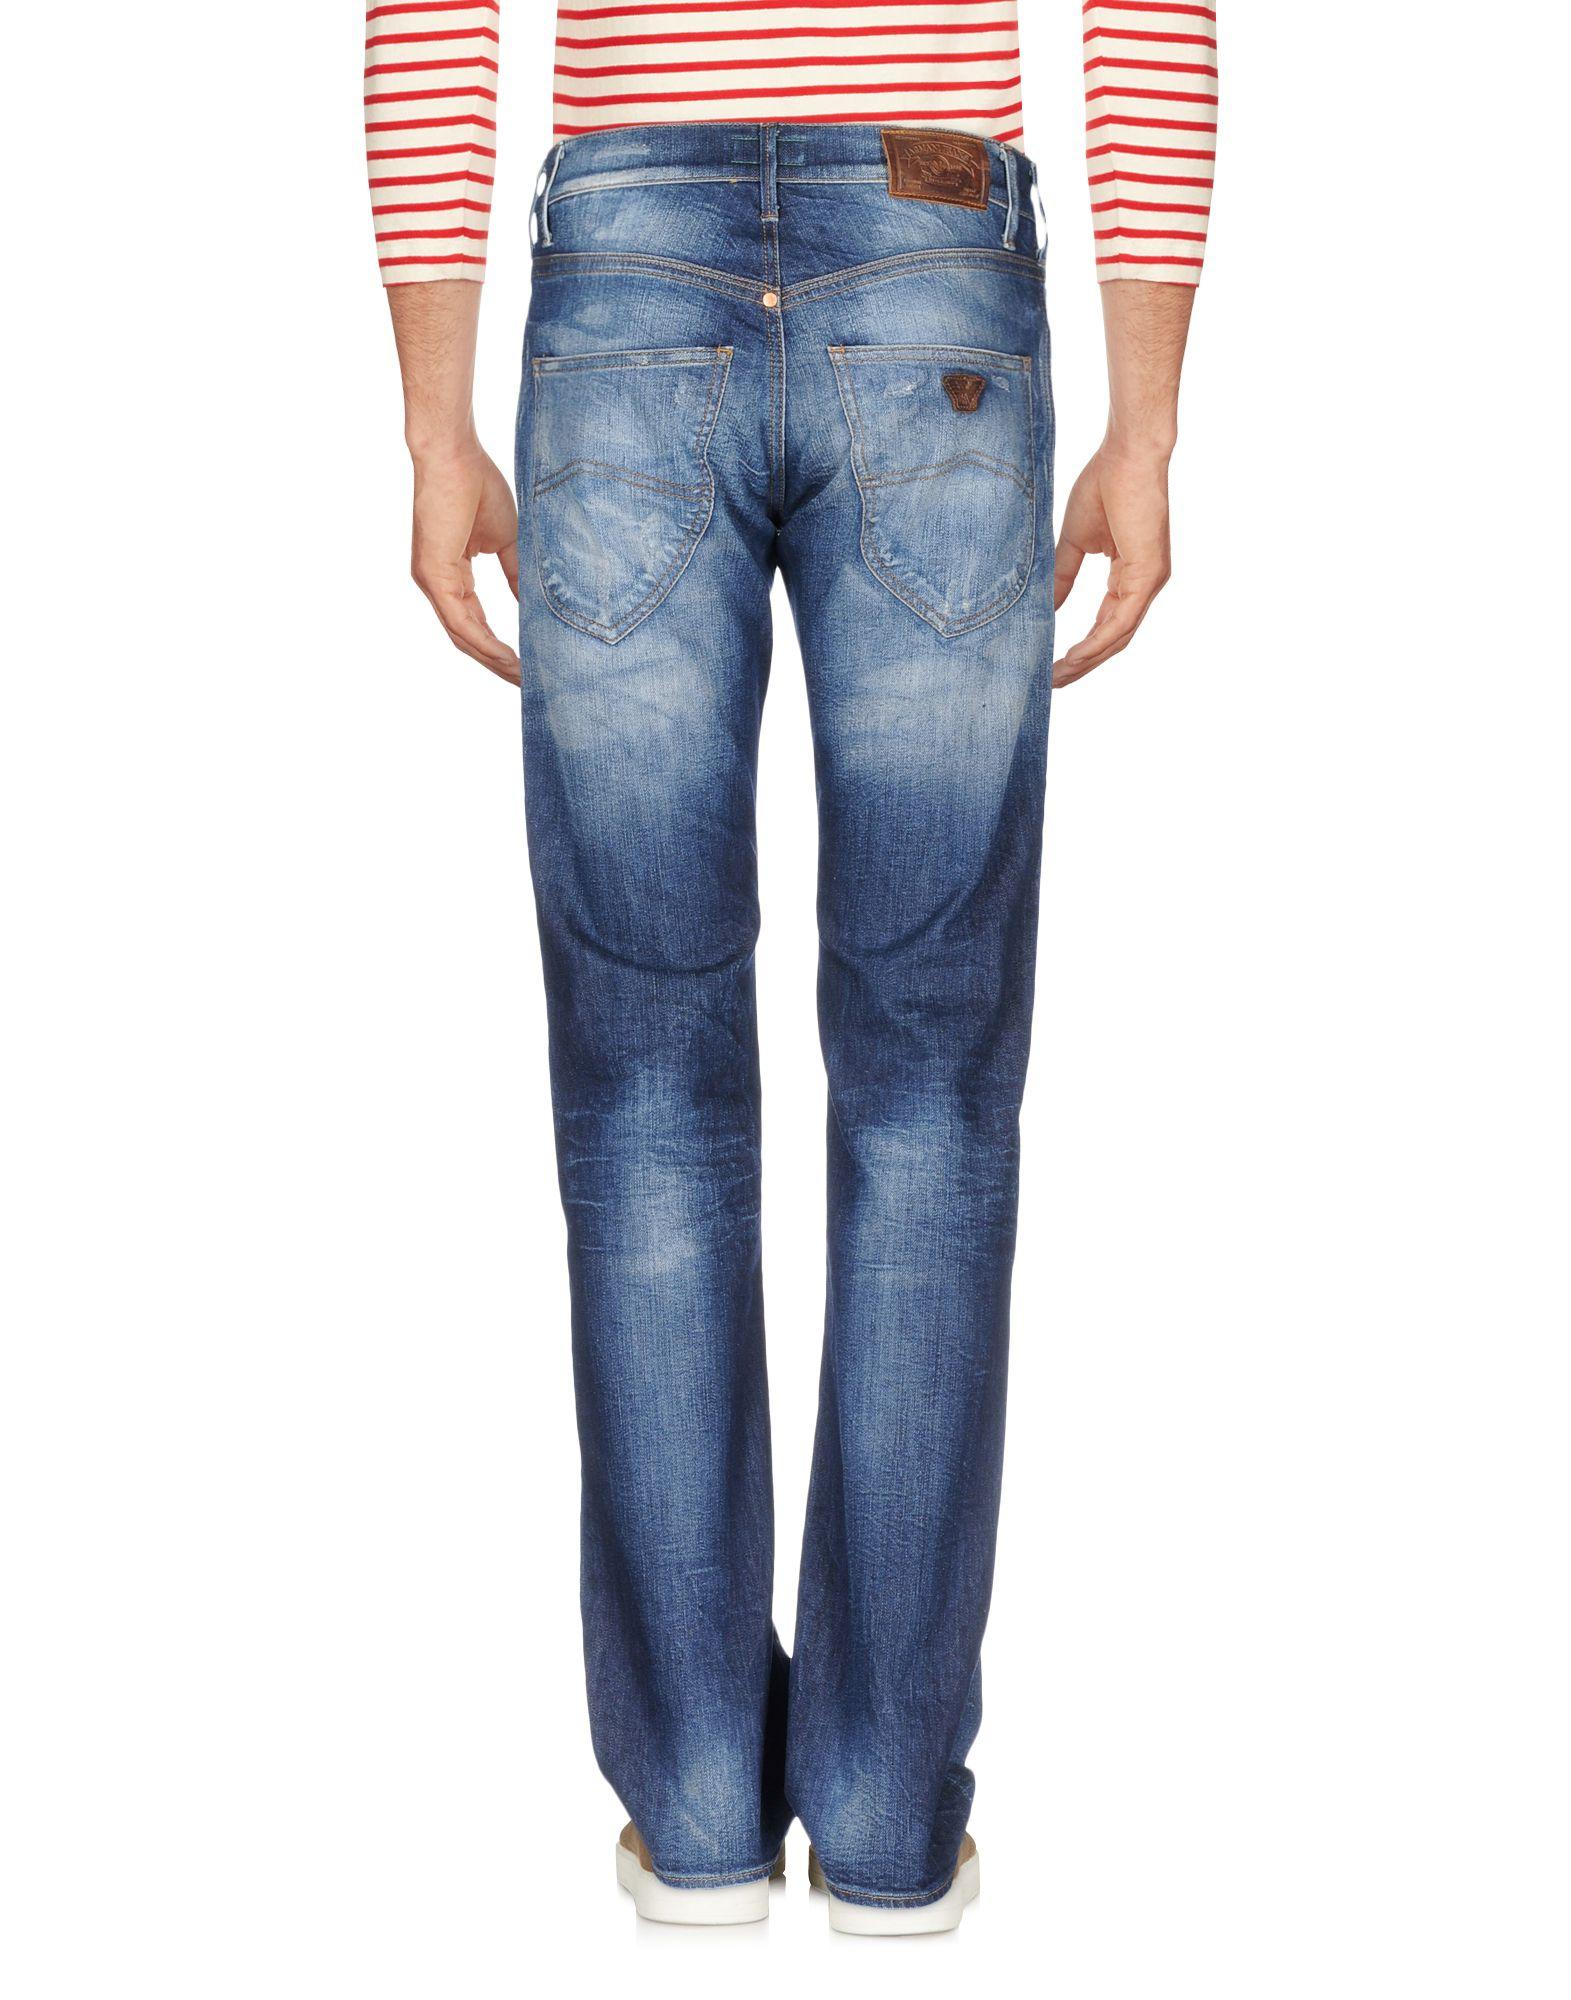 Pantaloni Jeans Armani Jeans Uomo 42647290HX - 42647290HX Uomo 10d8e5